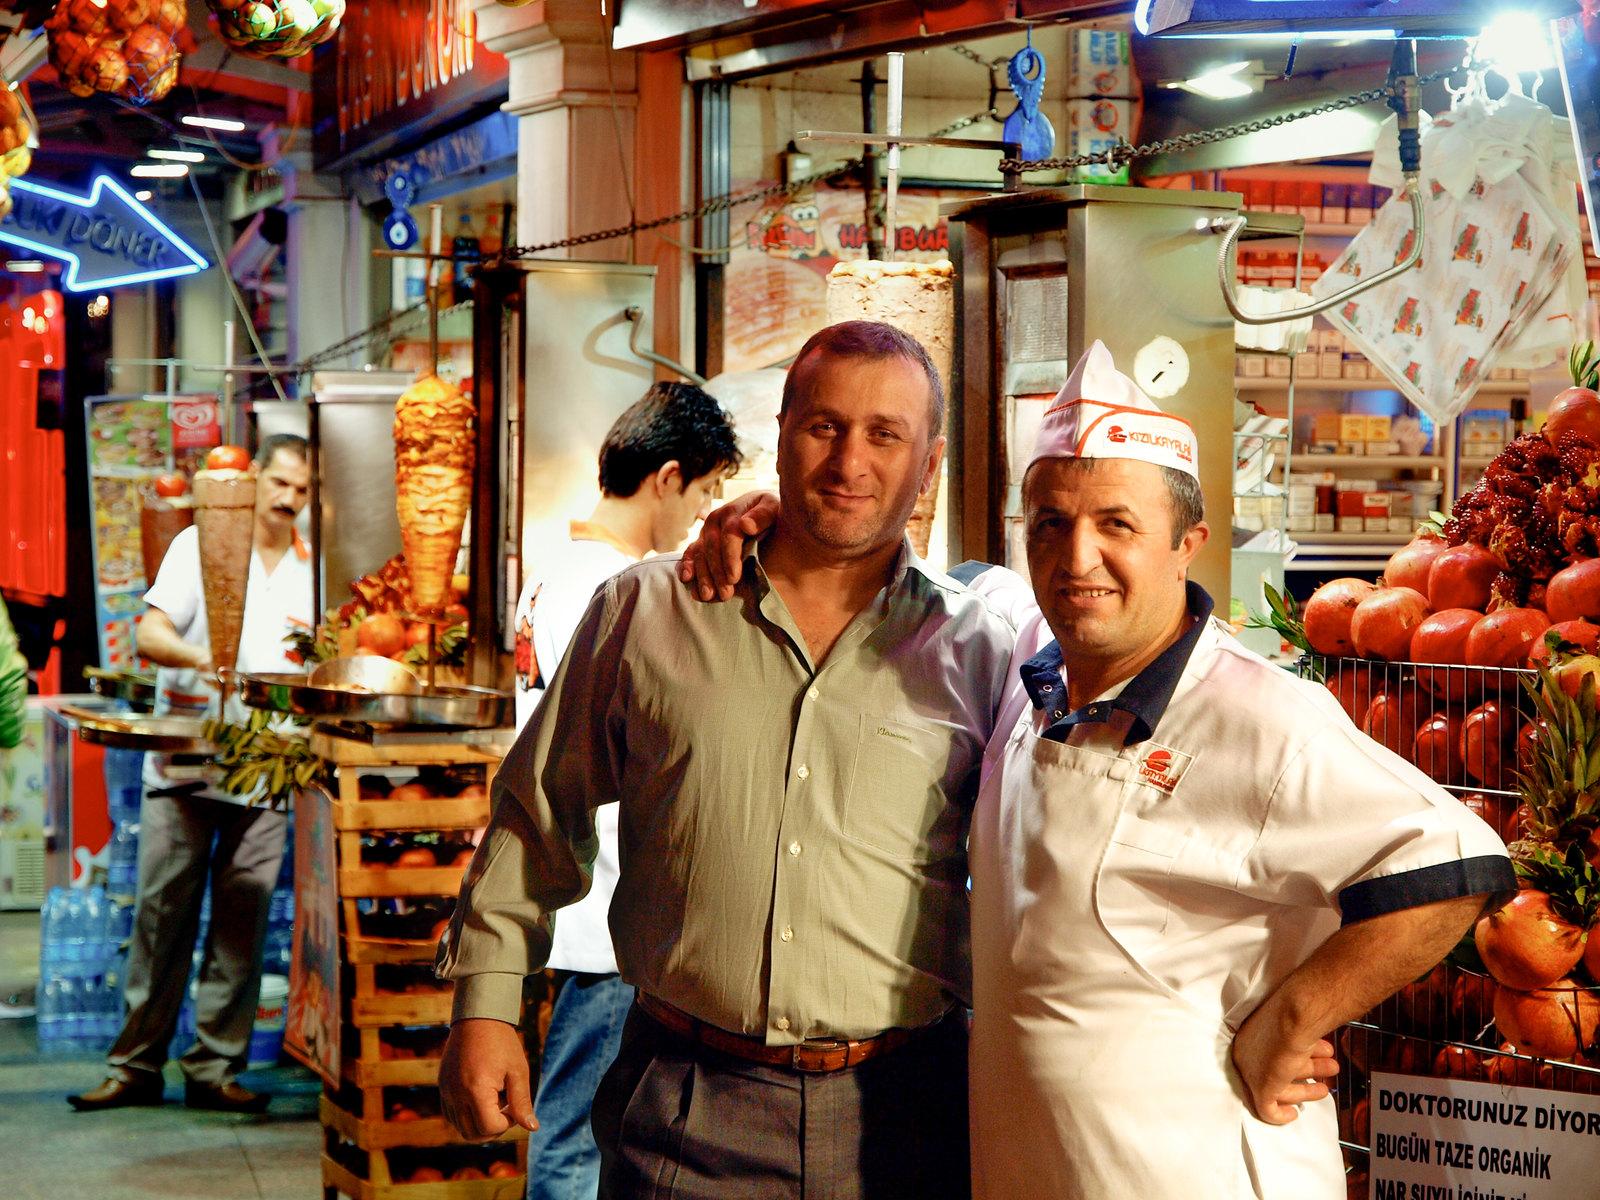 Portraits d'Istanbul - les vendeurs de kebab